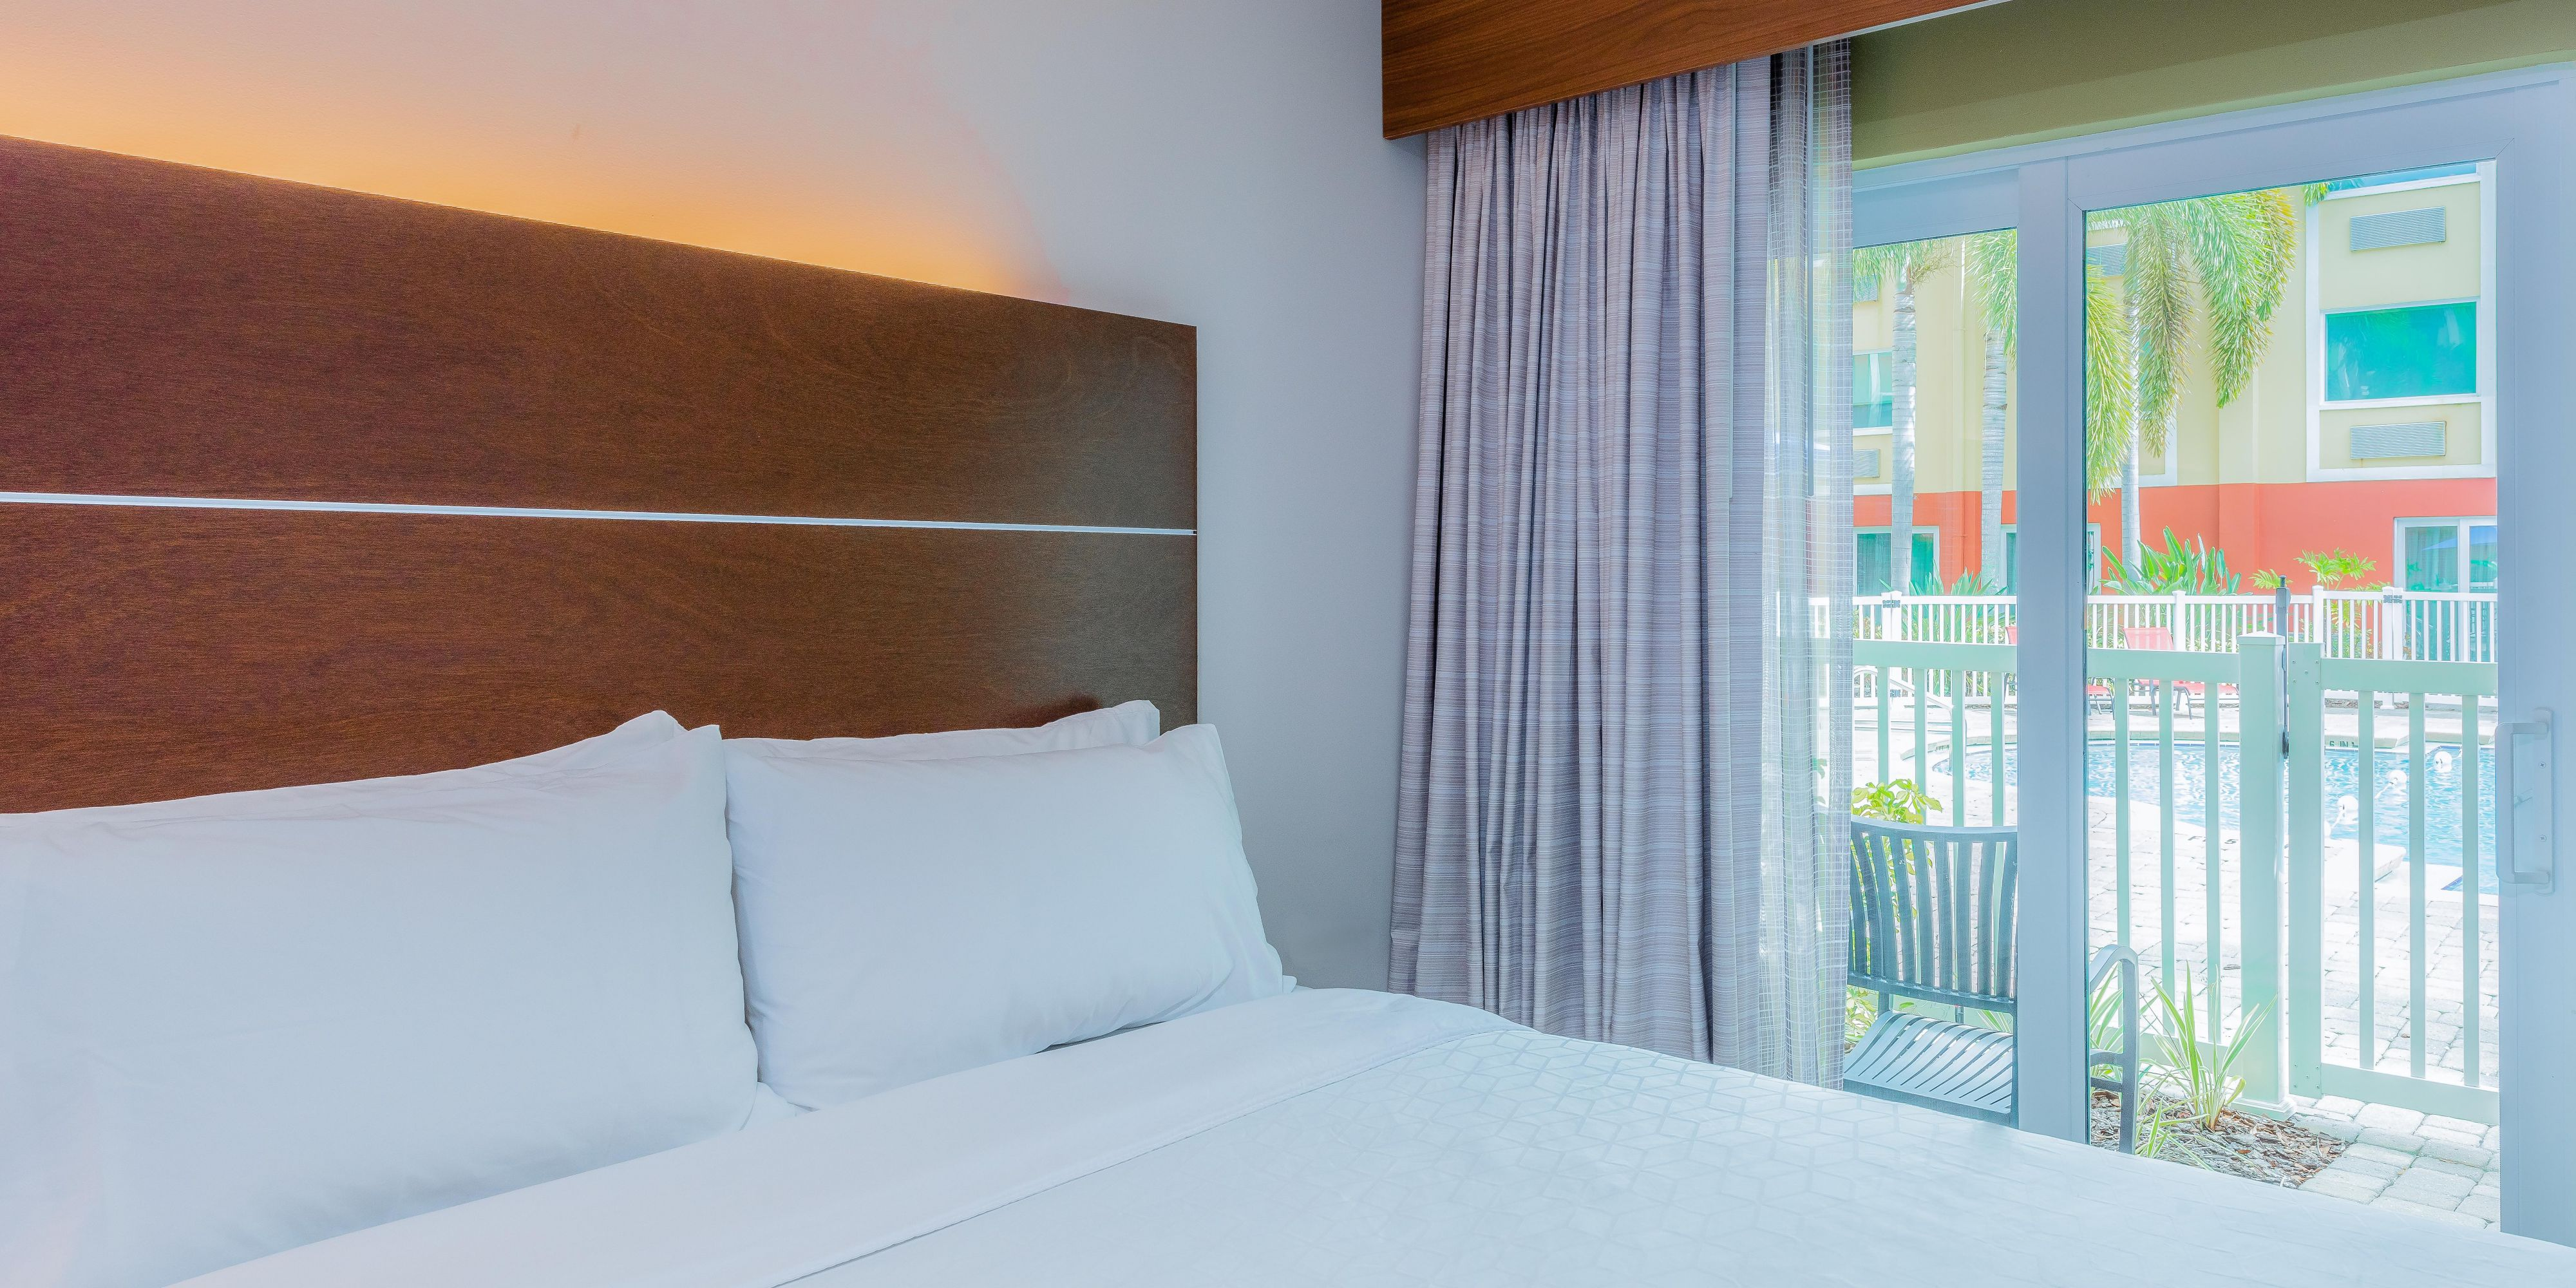 Fine Hotel In Bradenton Beach Fl Holiday Inn Express Suites Inzonedesignstudio Interior Chair Design Inzonedesignstudiocom